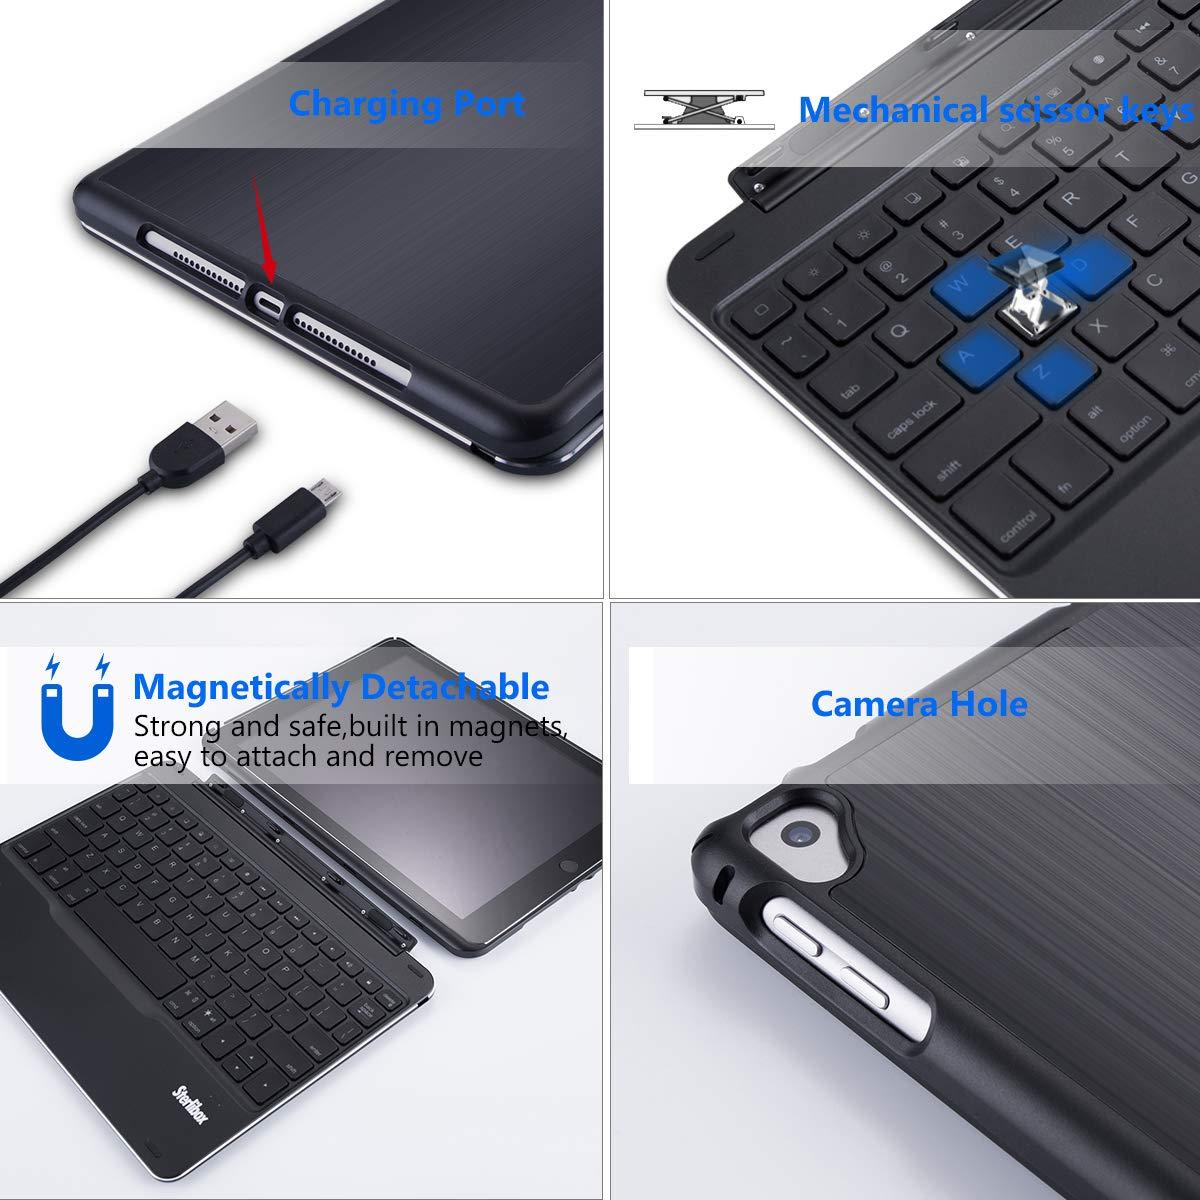 iPad Keyboard Case for The 2018 iPad (6th Gen), 2017 iPad (5th Gen), iPad Pro 9.7, iPad Air 1 - Auto Sleep/Wake - Detachable & Quiet - 7 Color Backlit - Wireless/Bluetooth - iPad Case with Keyboard by Sterlibox (Image #6)